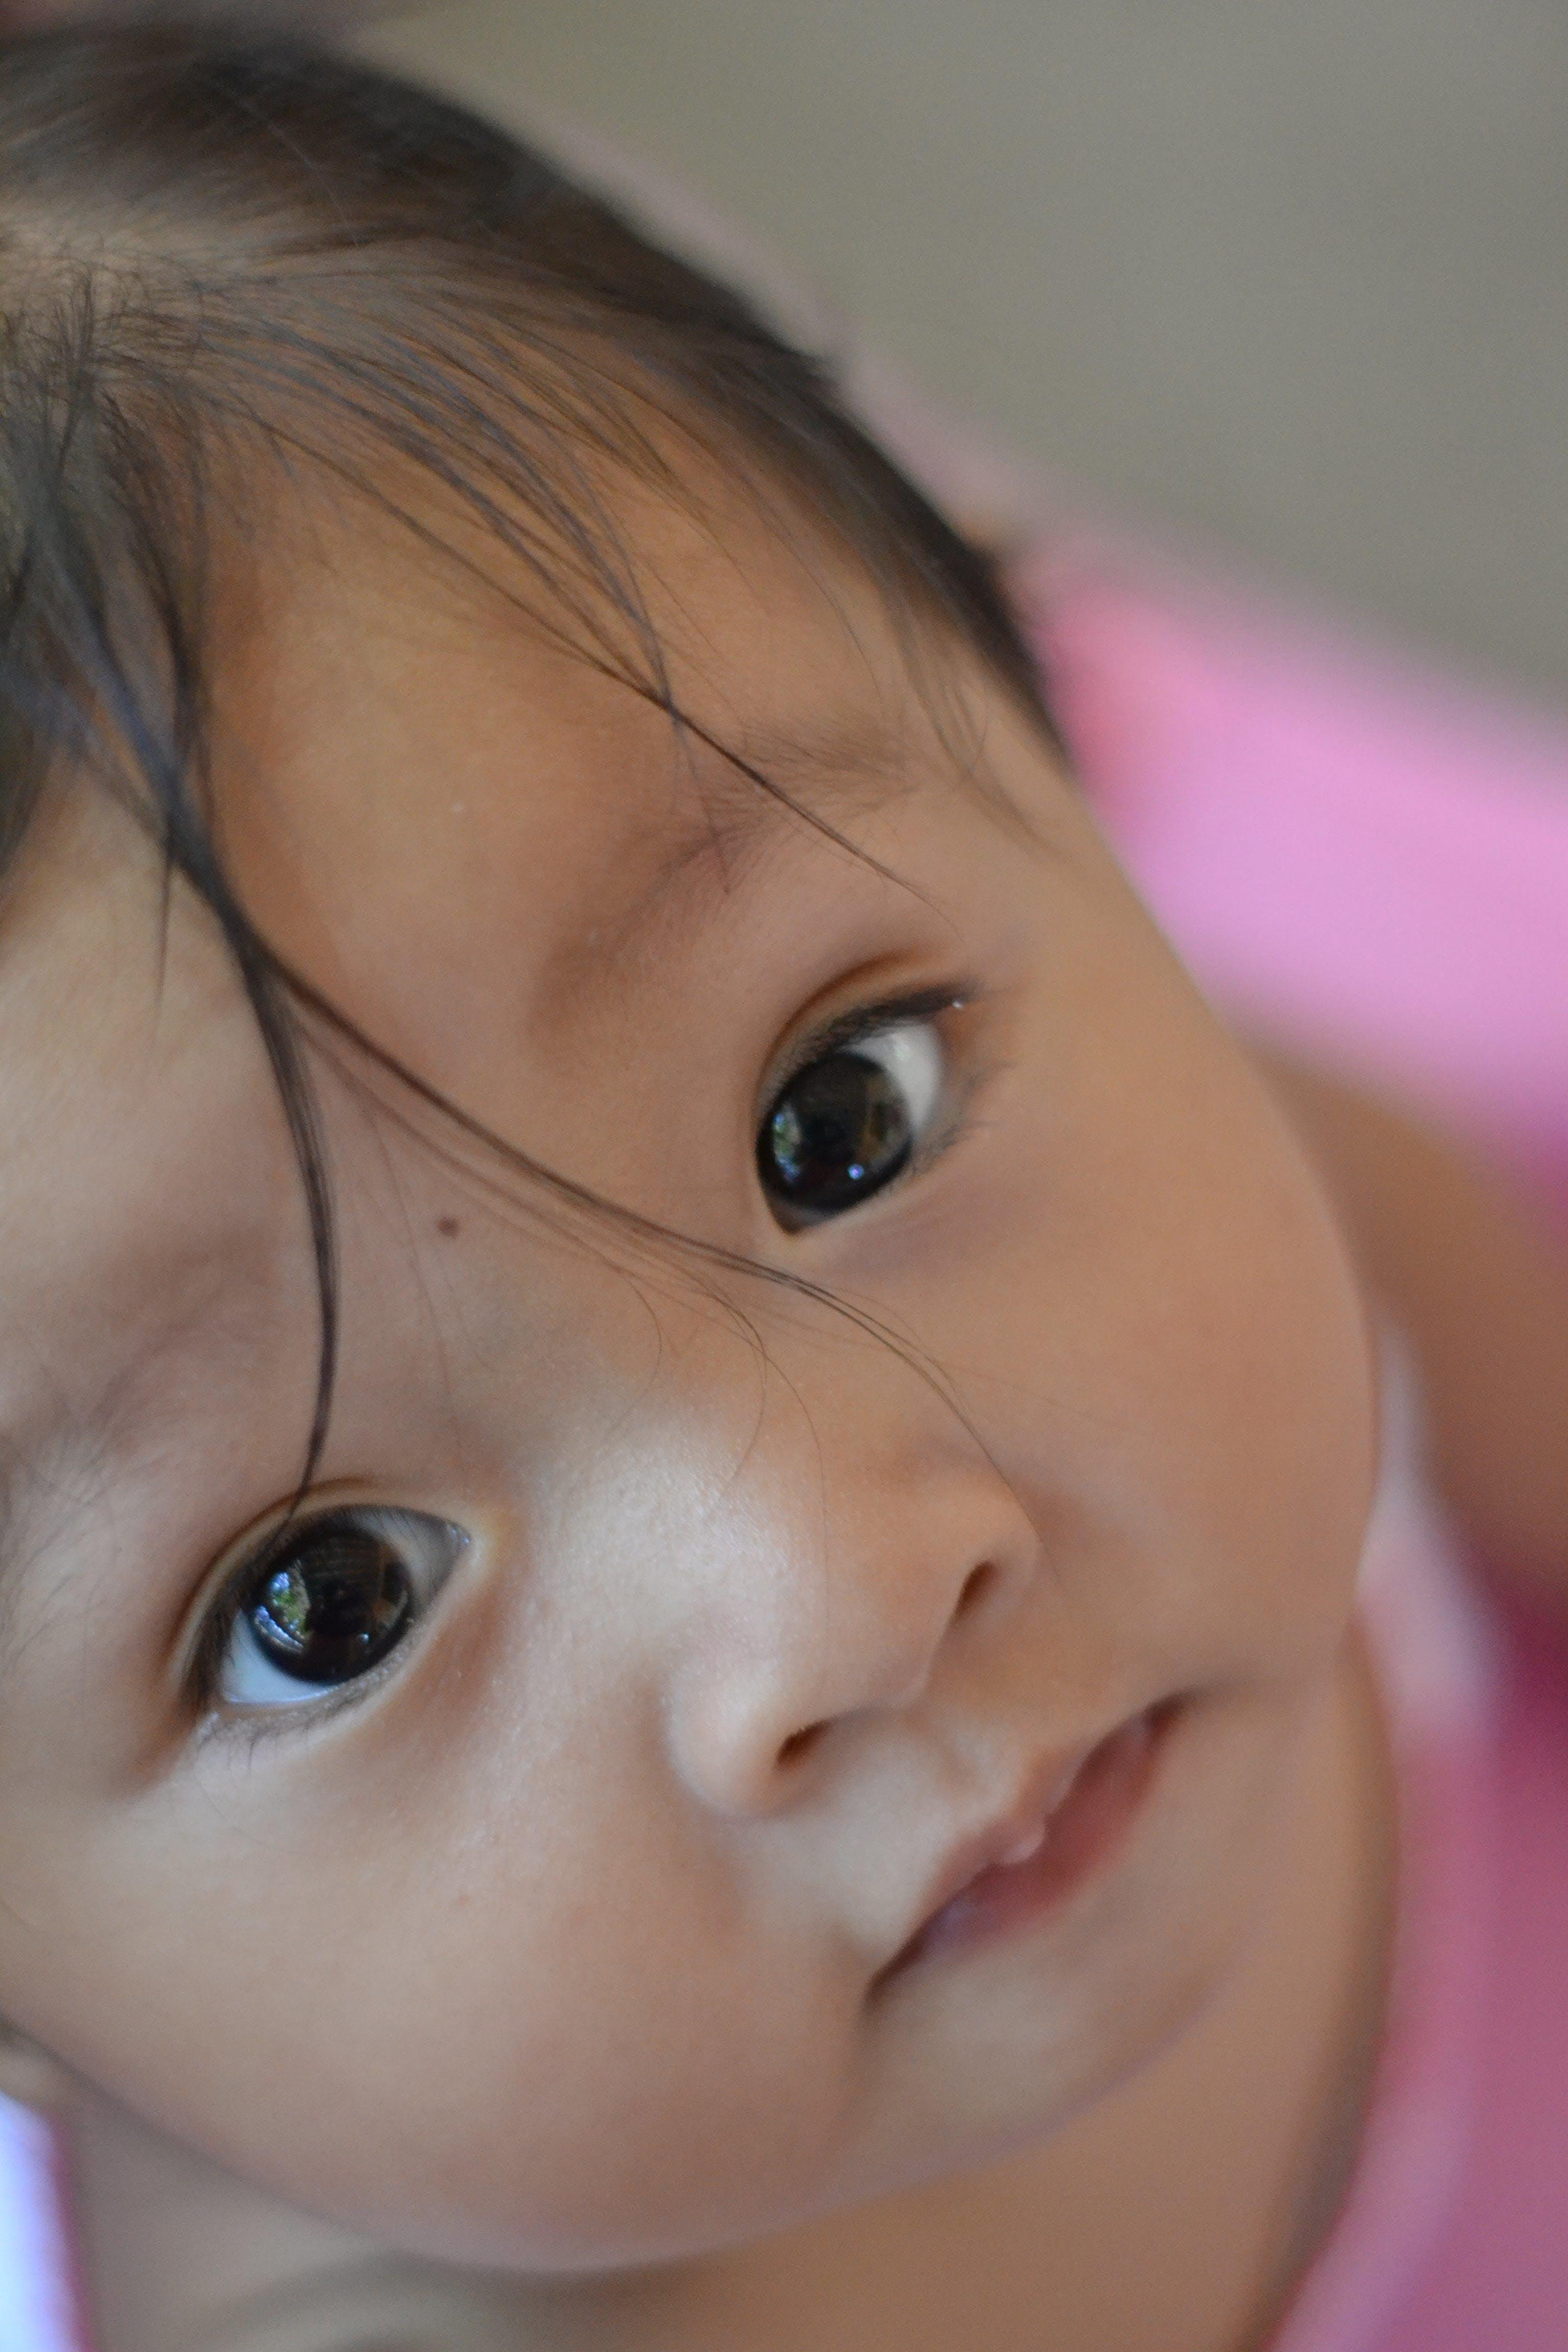 Free stock photo of baby, baby girl, pink